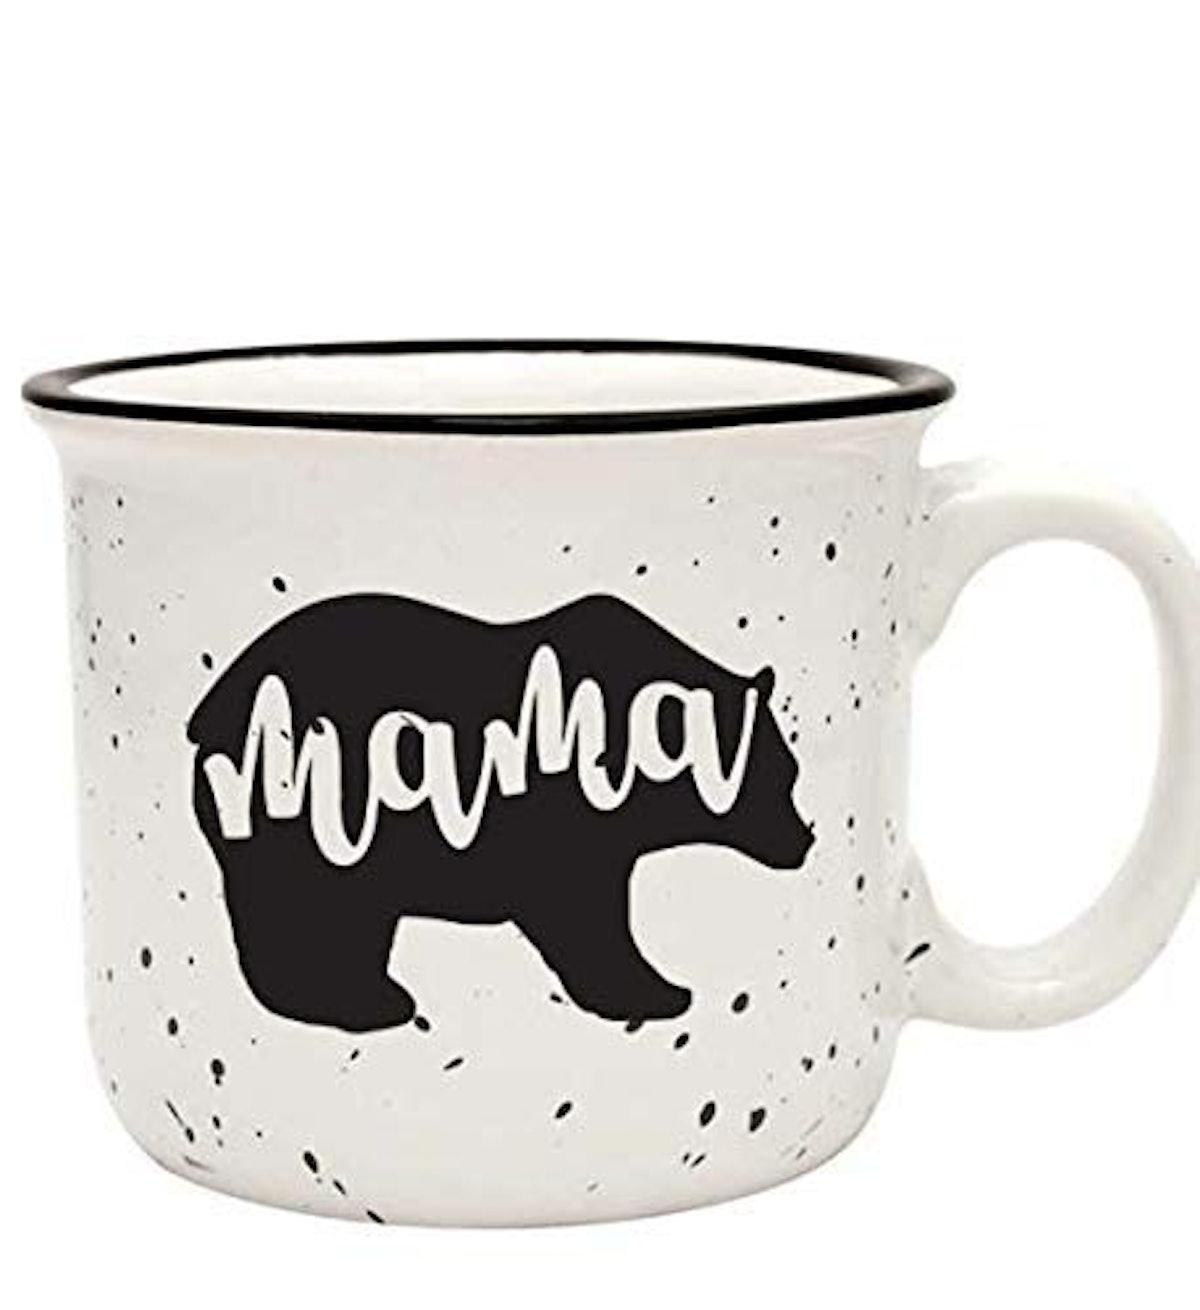 Cute Girly Coffee Mug for Mom